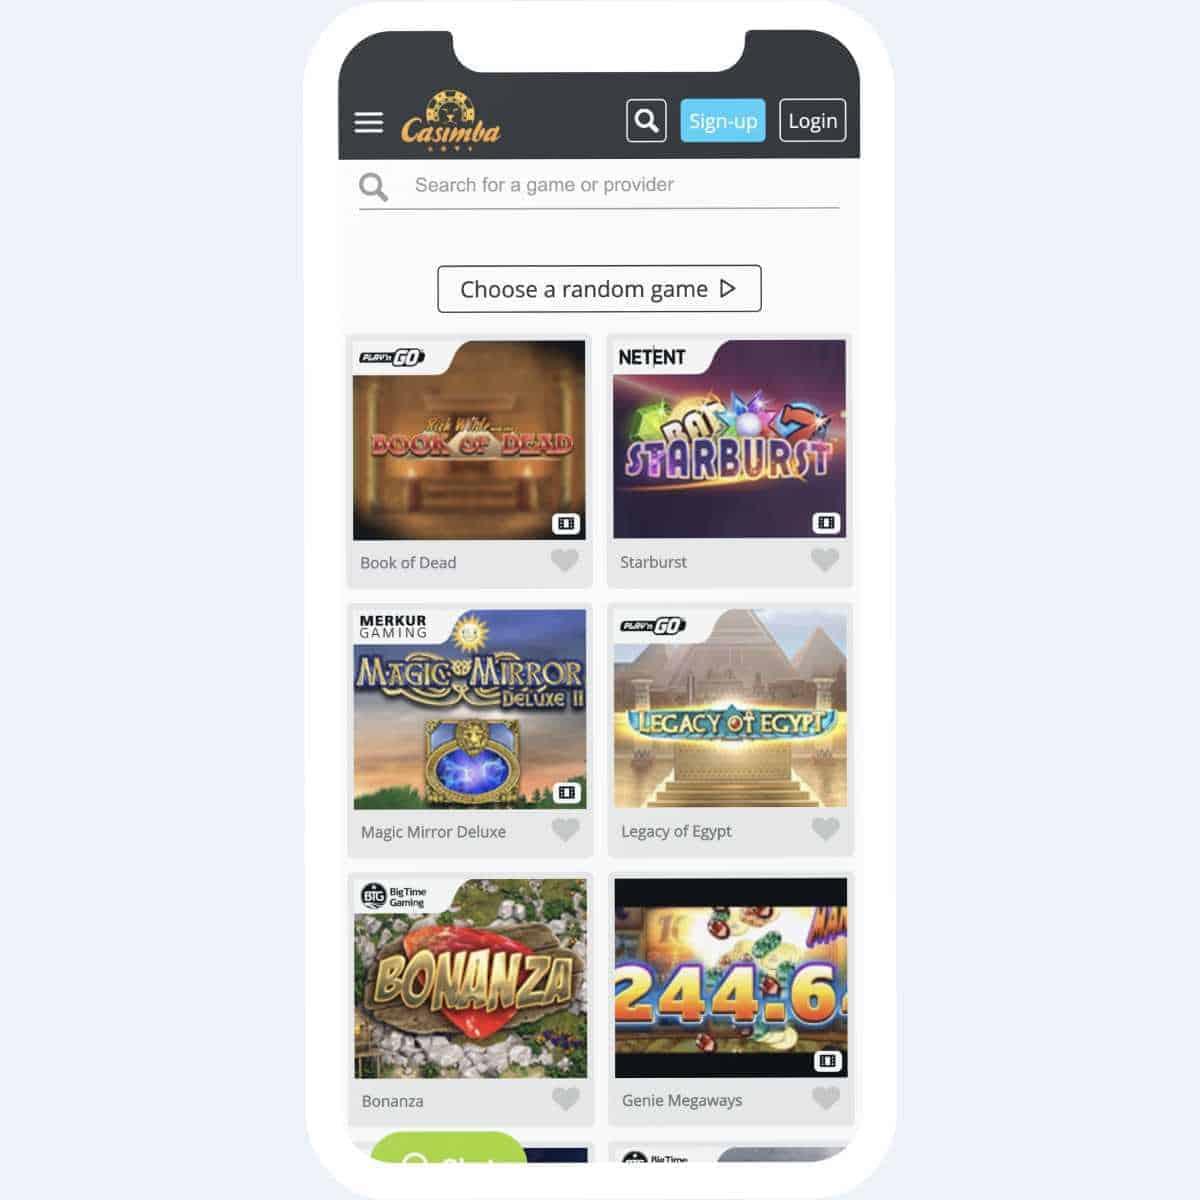 casimba games mobile